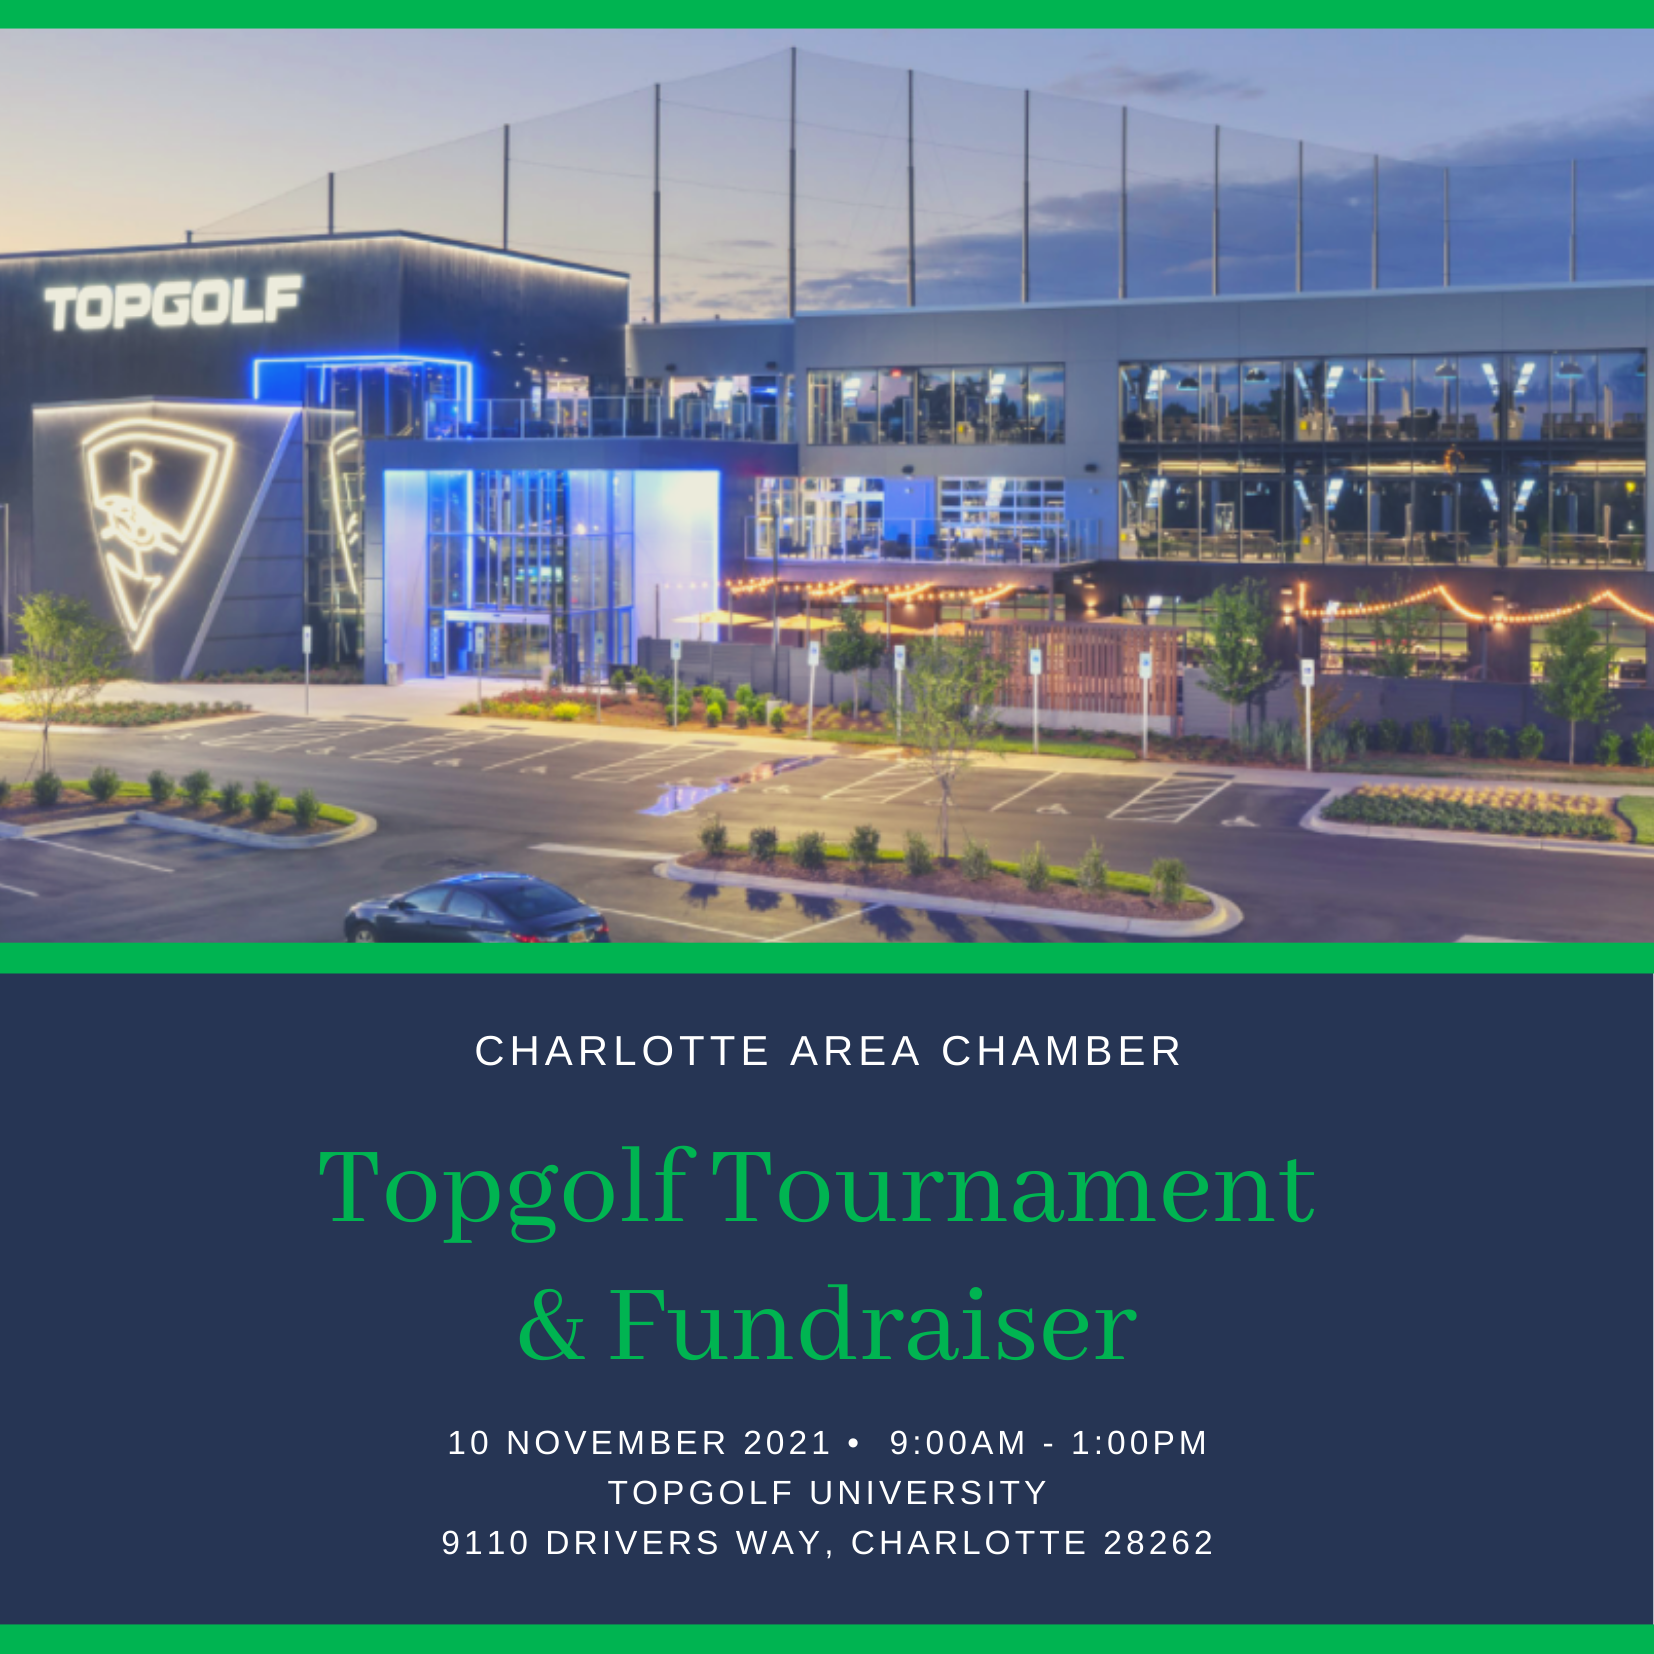 Topgolf Tournament & Fundraiser